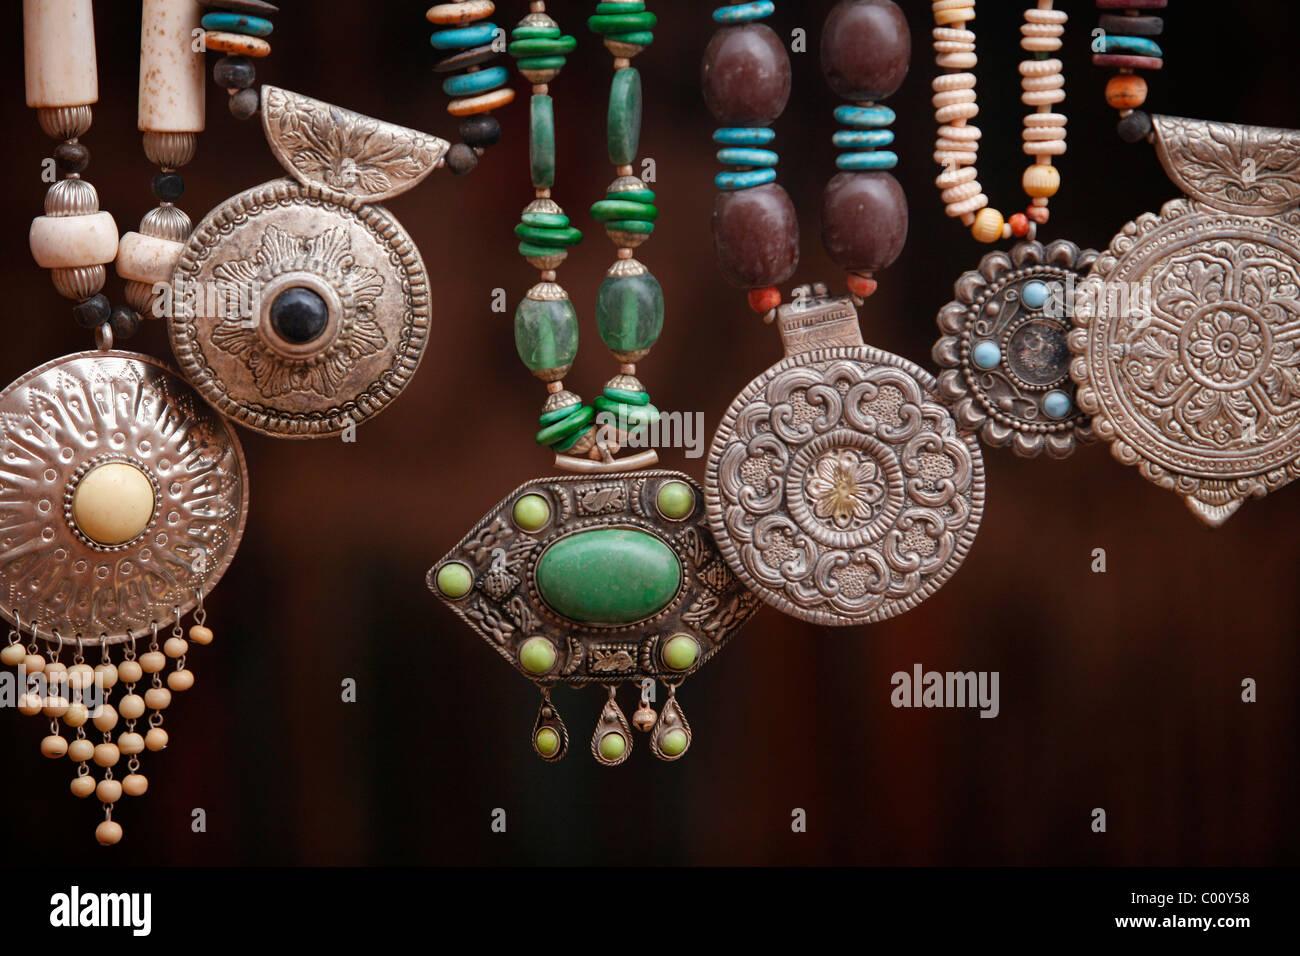 Bedouin silver jewellery, Petra, Jordan. - Stock Image